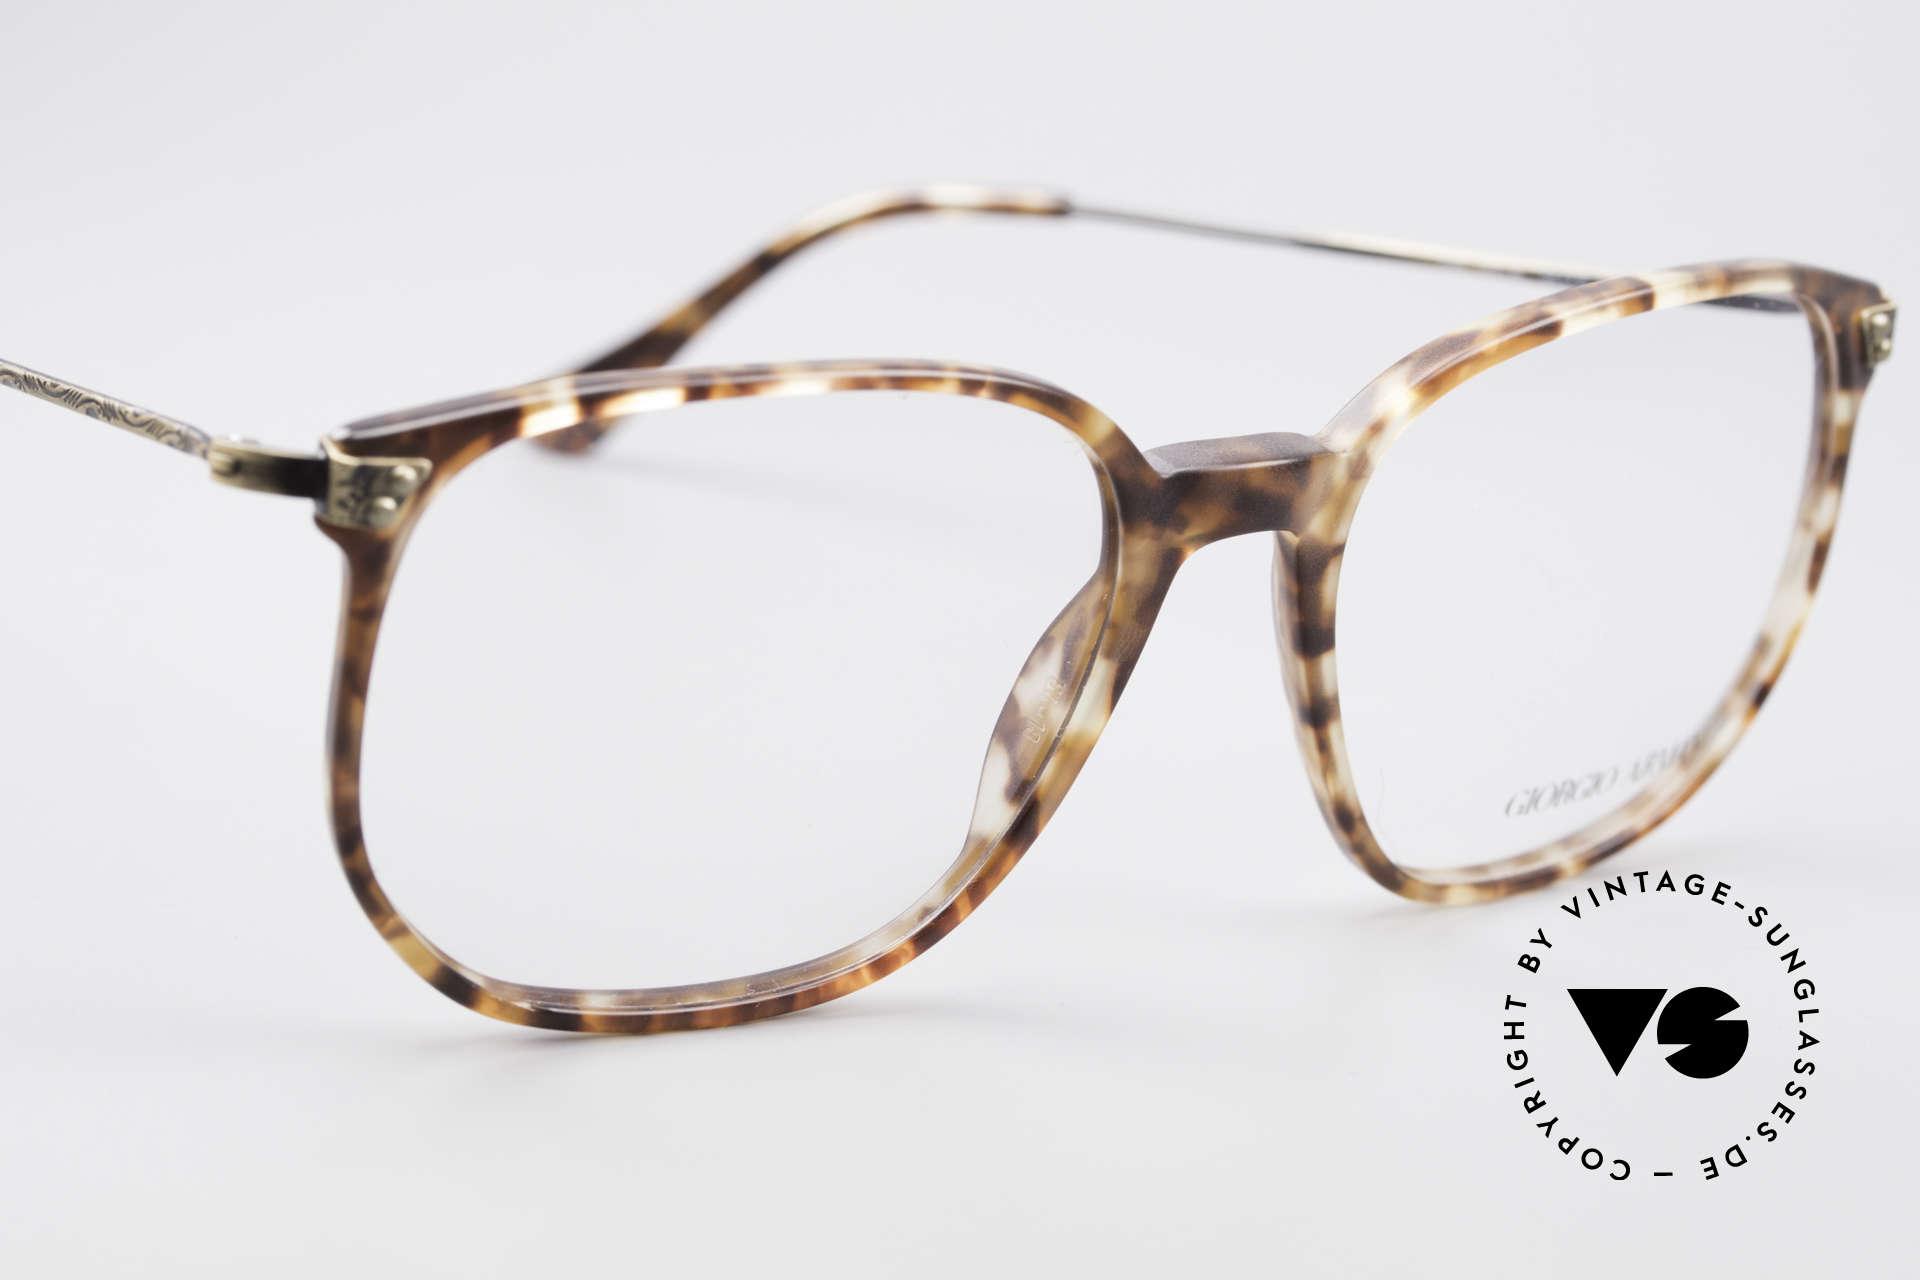 Giorgio Armani 335 True Vintage Eyeglasses, unworn (like all our vintage Giorgio Armani specs), Made for Men and Women